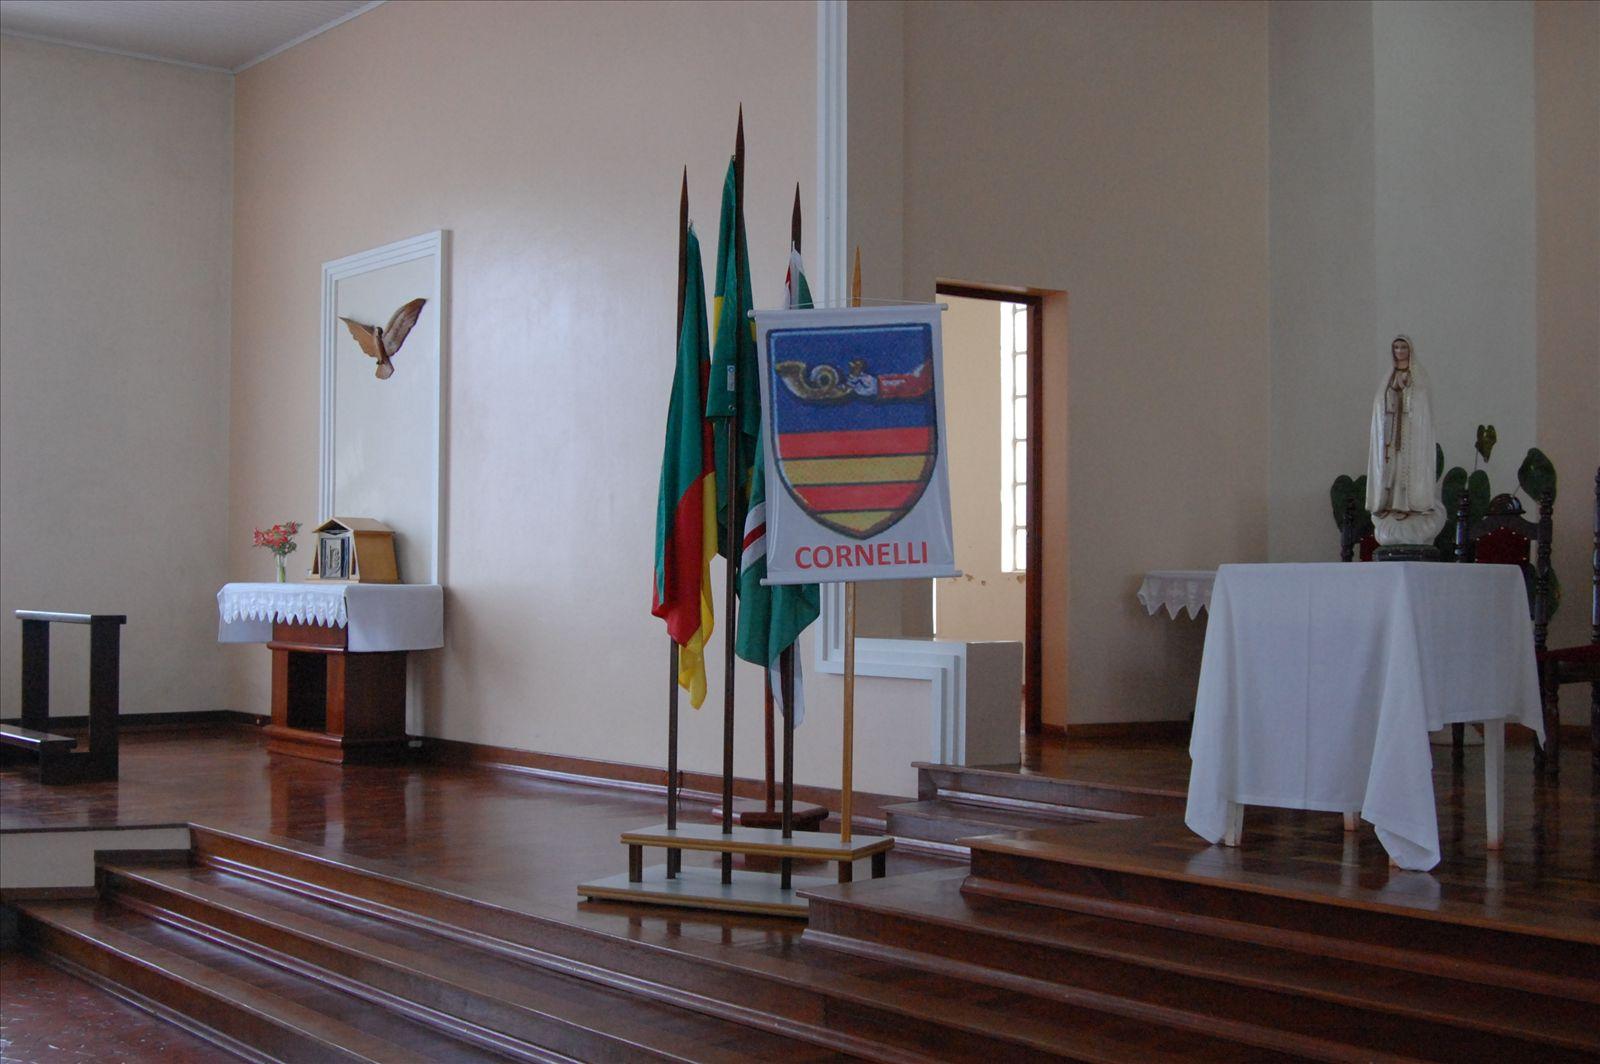 2º Encontro Família Cornelli - 11.10.2009 (115)_0